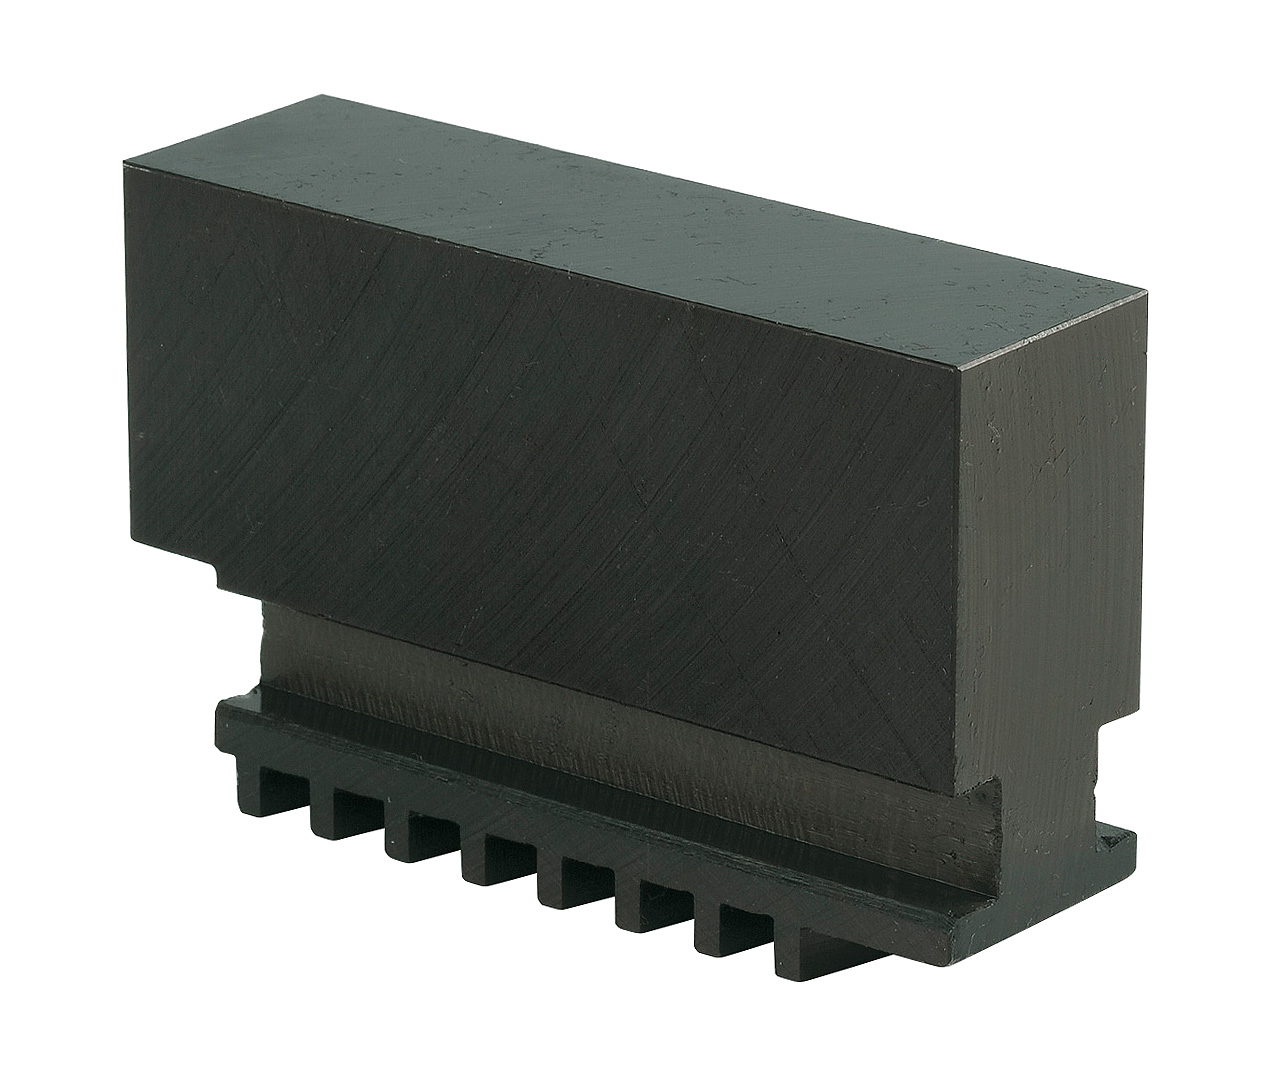 Szczęki jednolite miękkie - komplet DSJ-DK12-200 BERNARDO